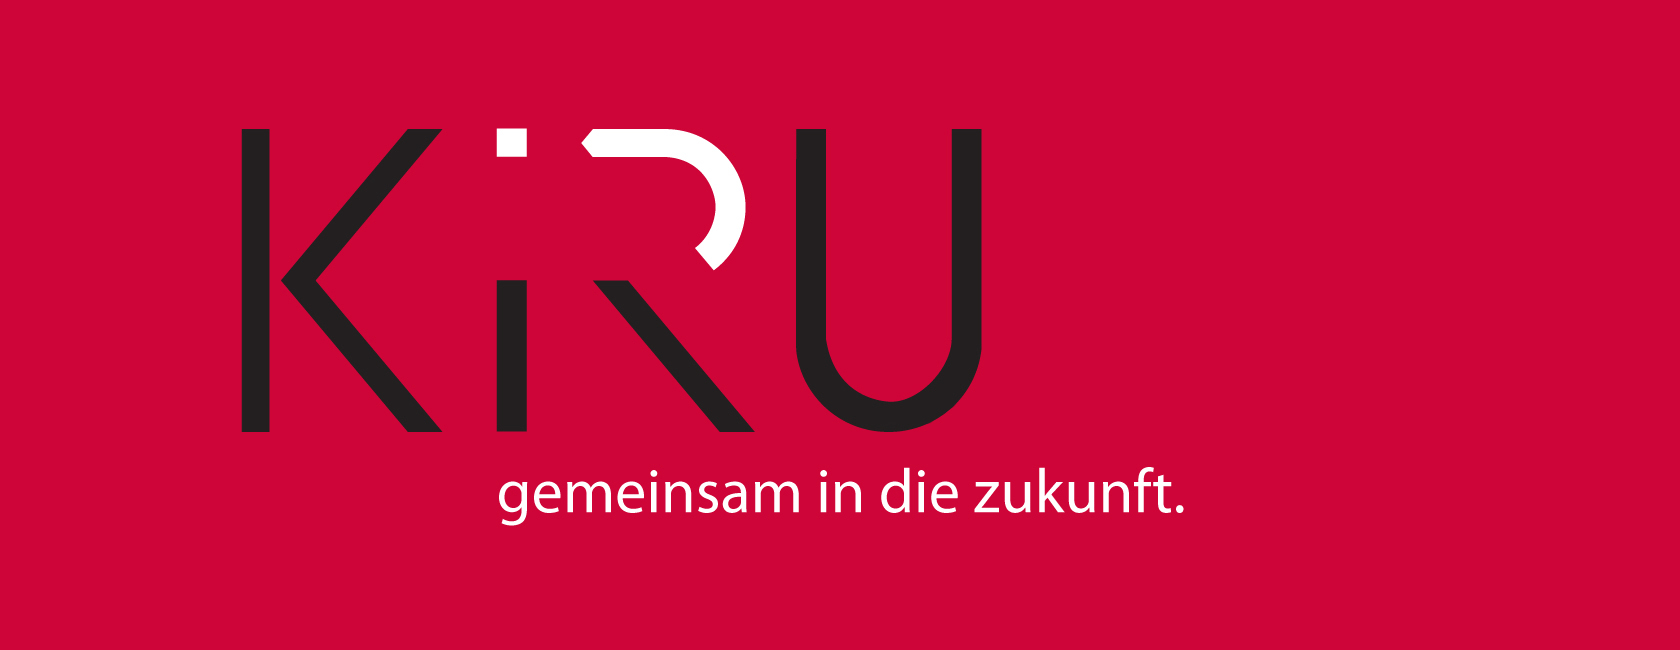 Kiru-Logo-Slide